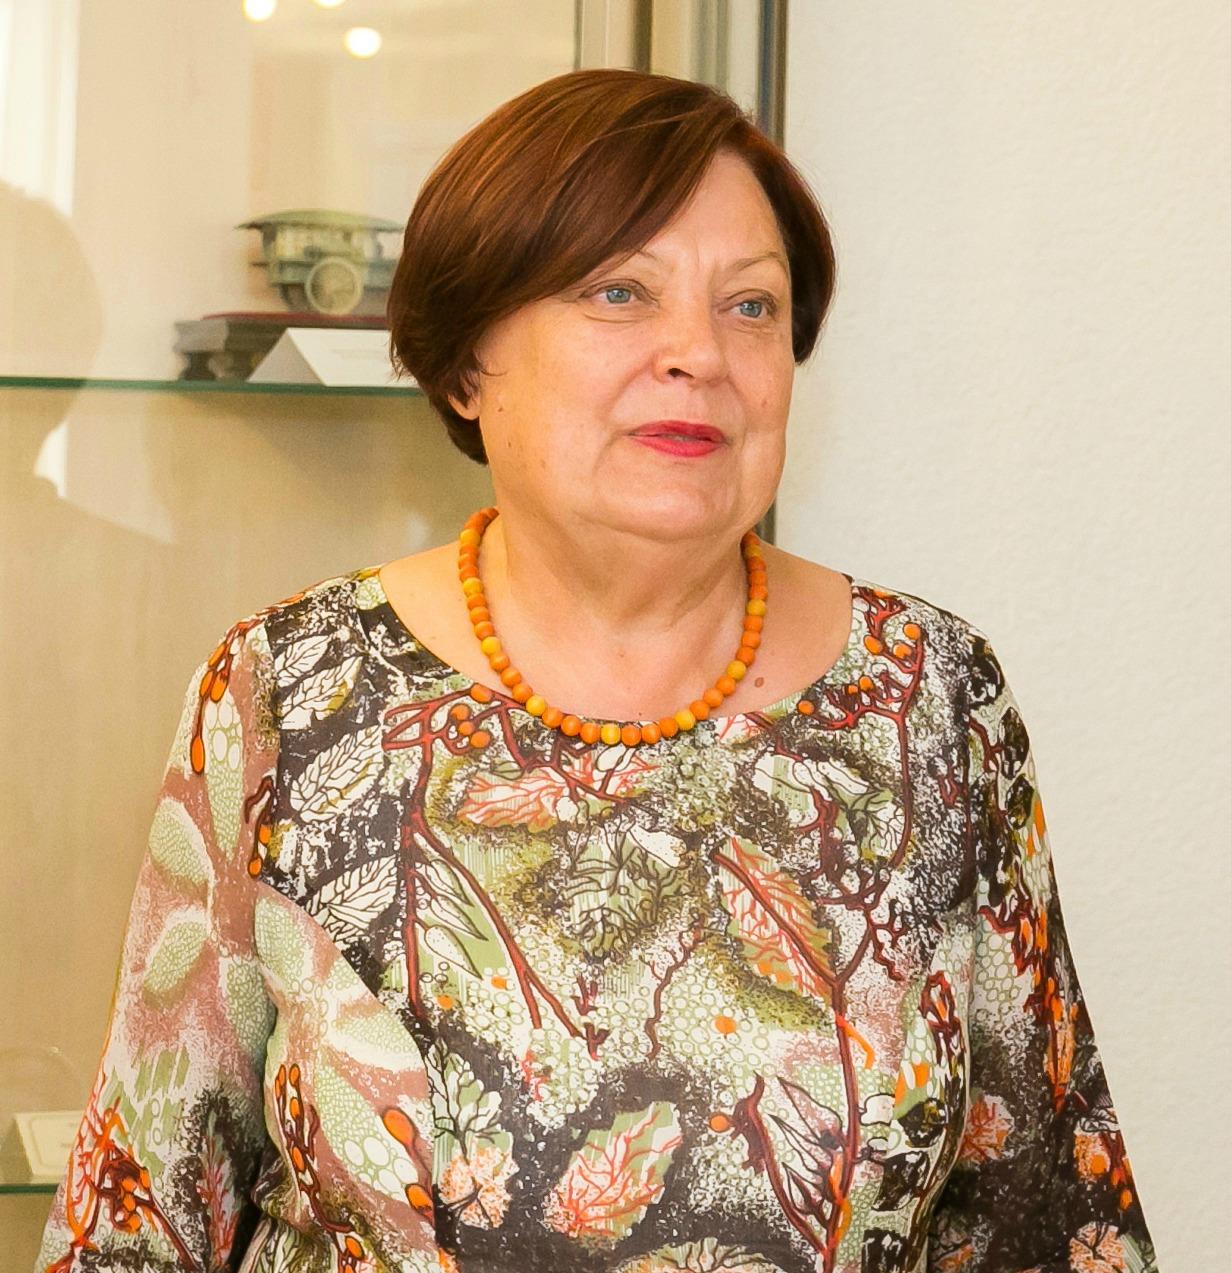 Giedrė Purvaneckienė, A. Rudomanskio nuotr.